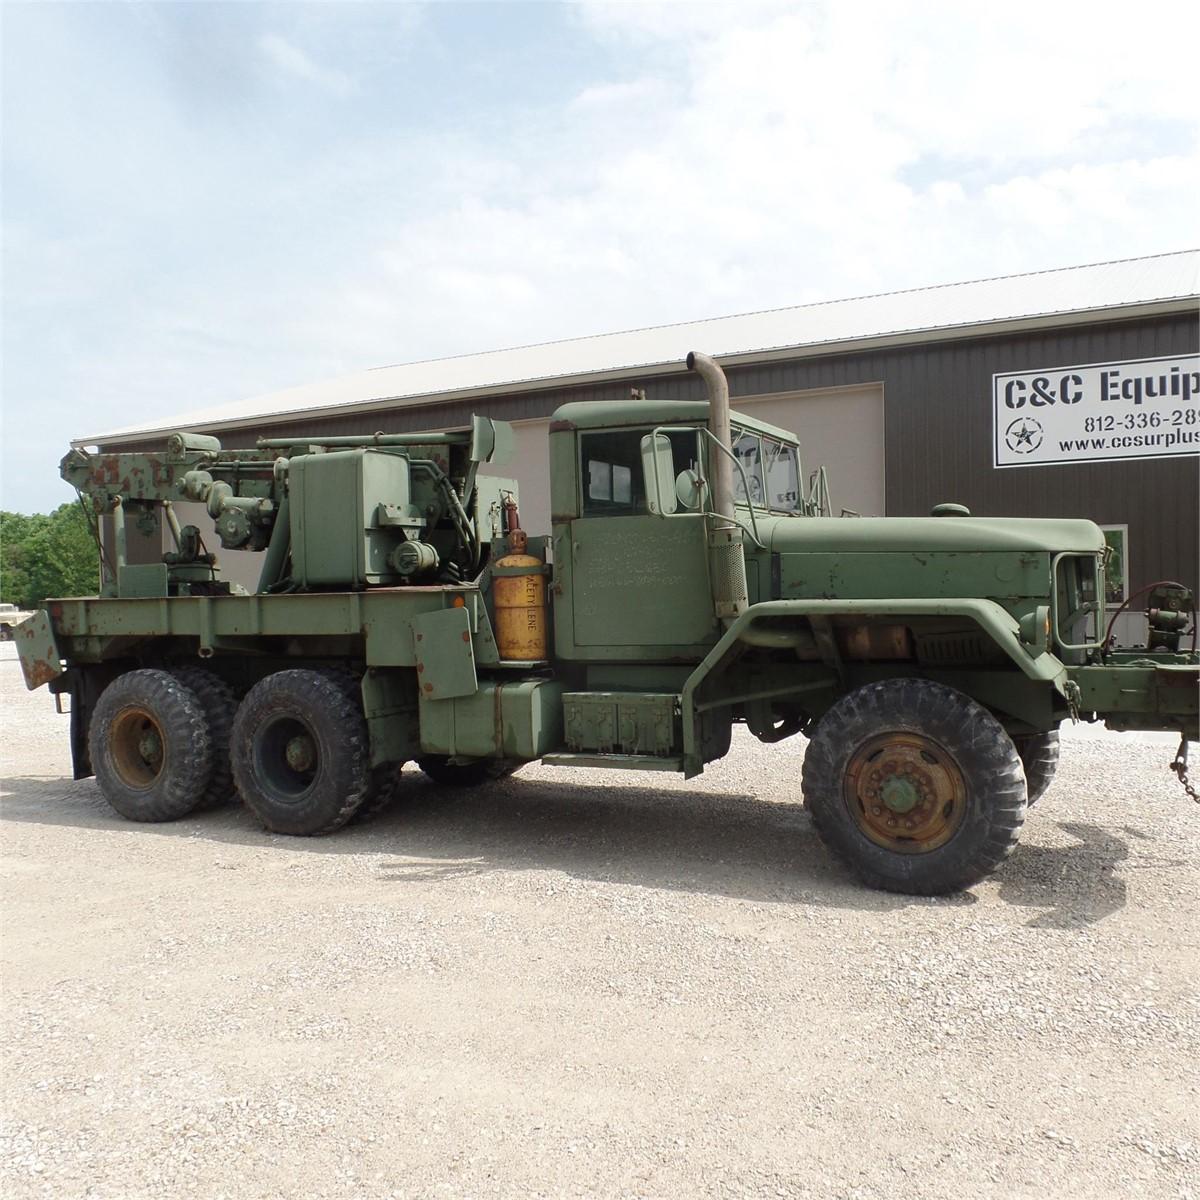 1971 AM GENERAL M816 For Sale In NASHVILLE, Indiana